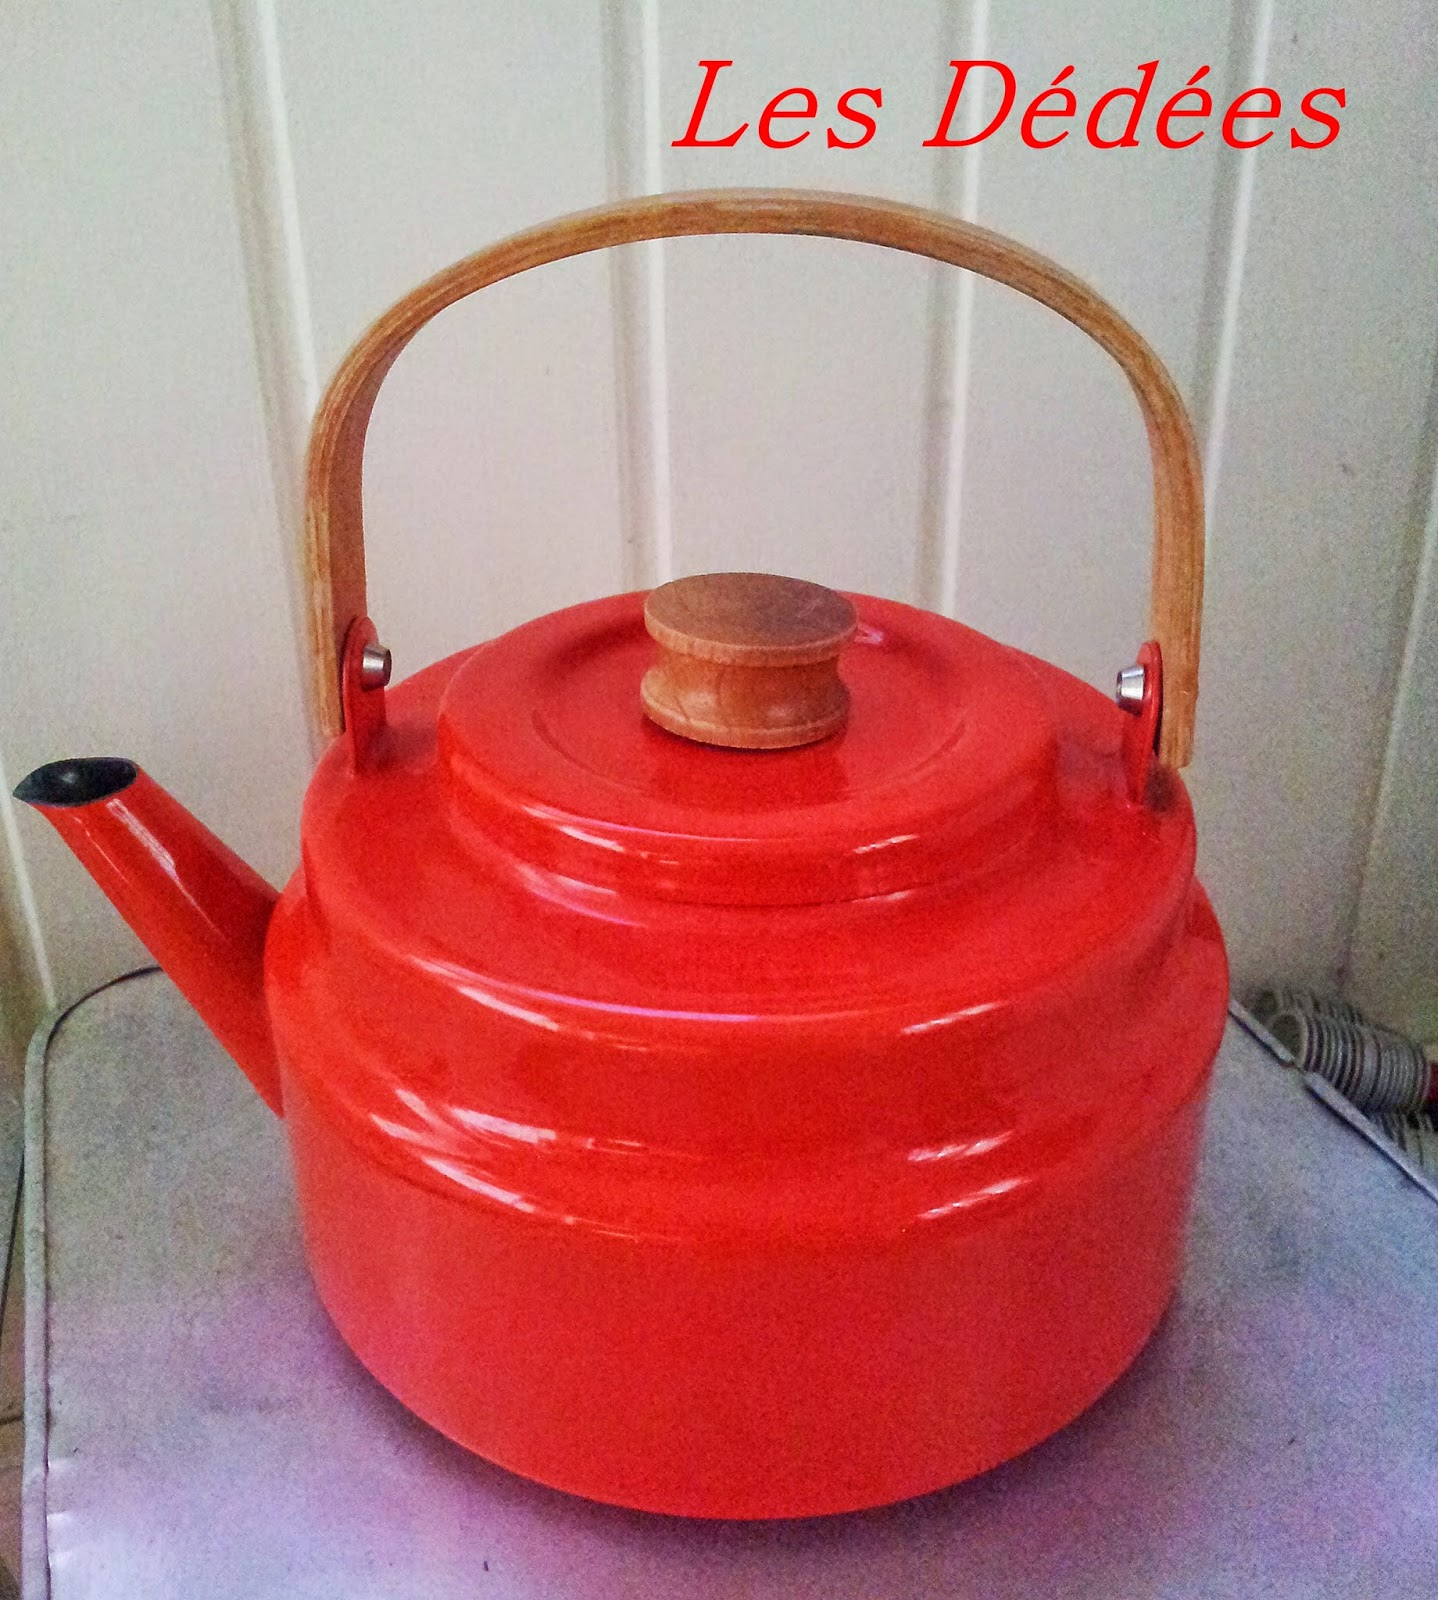 Les dedees : vintage, recup, creations: BOUILLOIRE EMAILLEE ...